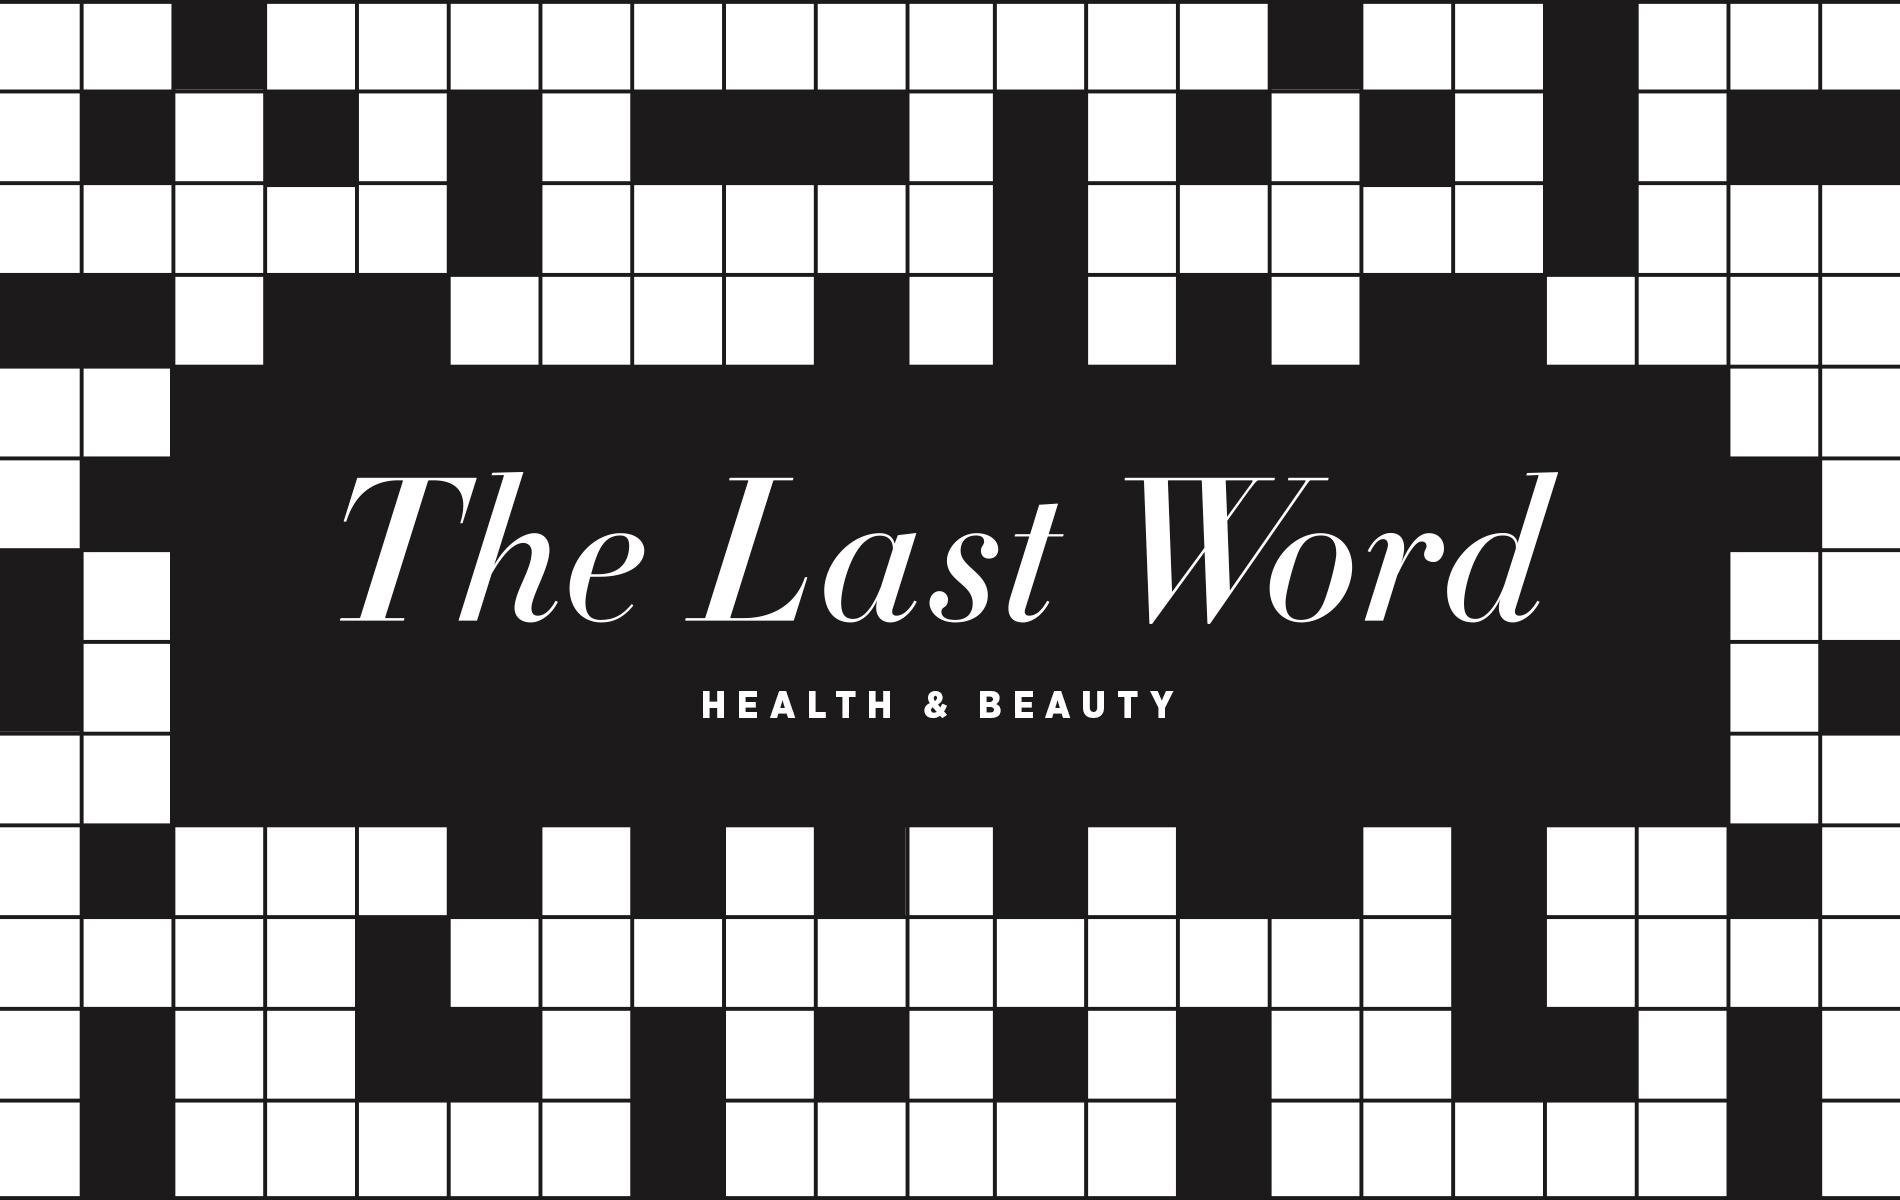 VIE Magazine - April 2019 - The Health & Wellness Issue - Crossword